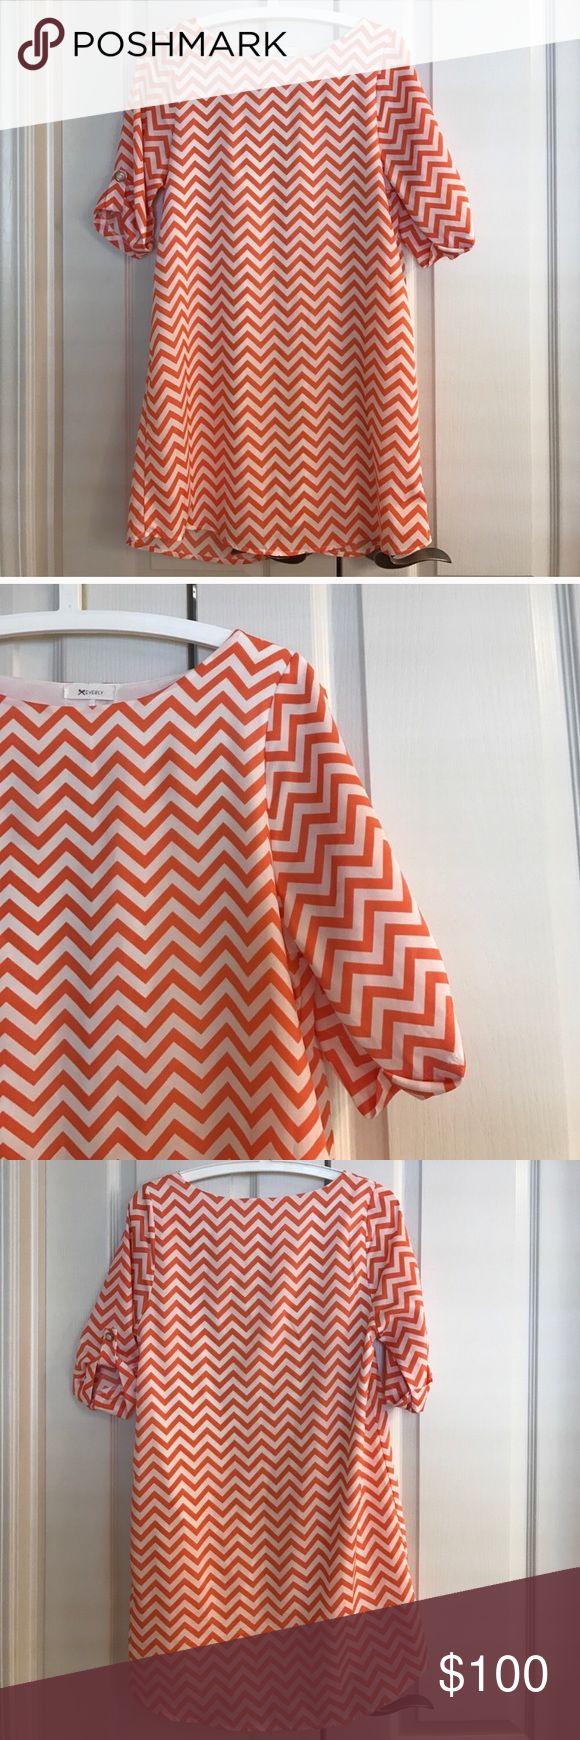 Size S Everly orange chevron shift dress Size S Everly orange chevron shift dress: polyester Everly Dresses